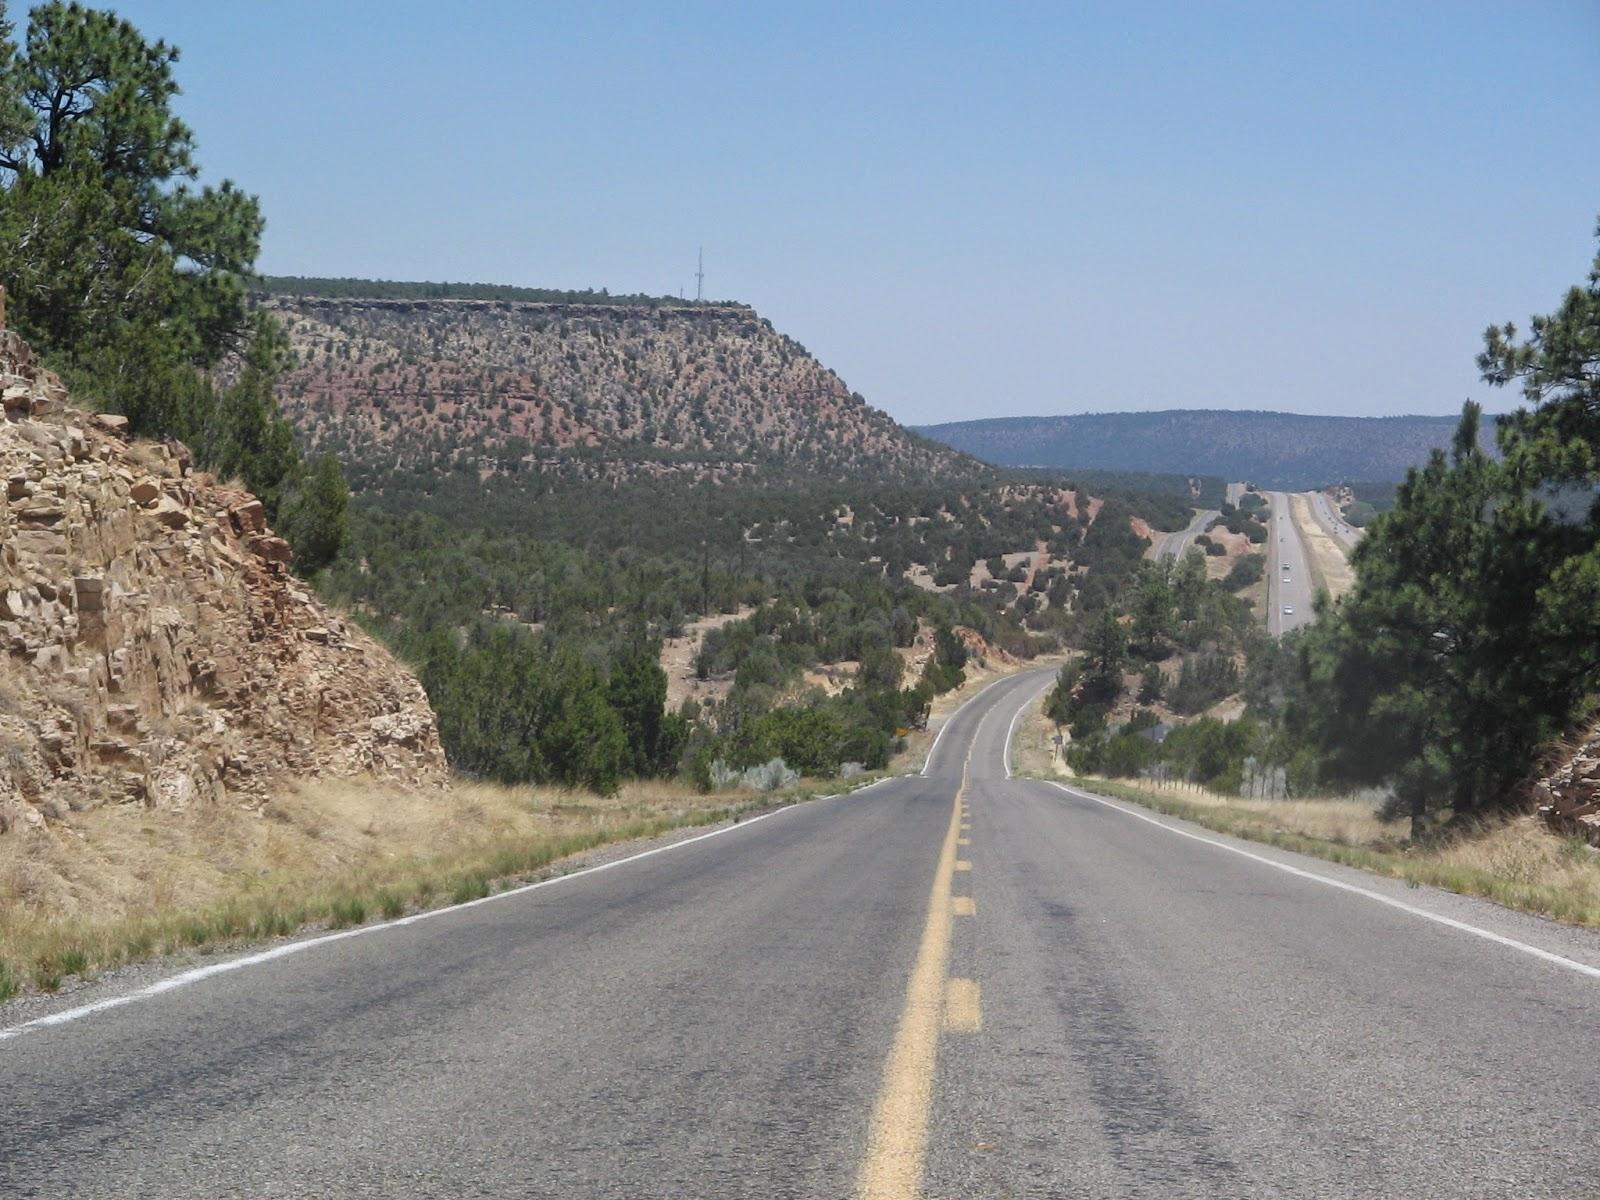 Ramblings From A Road Holic